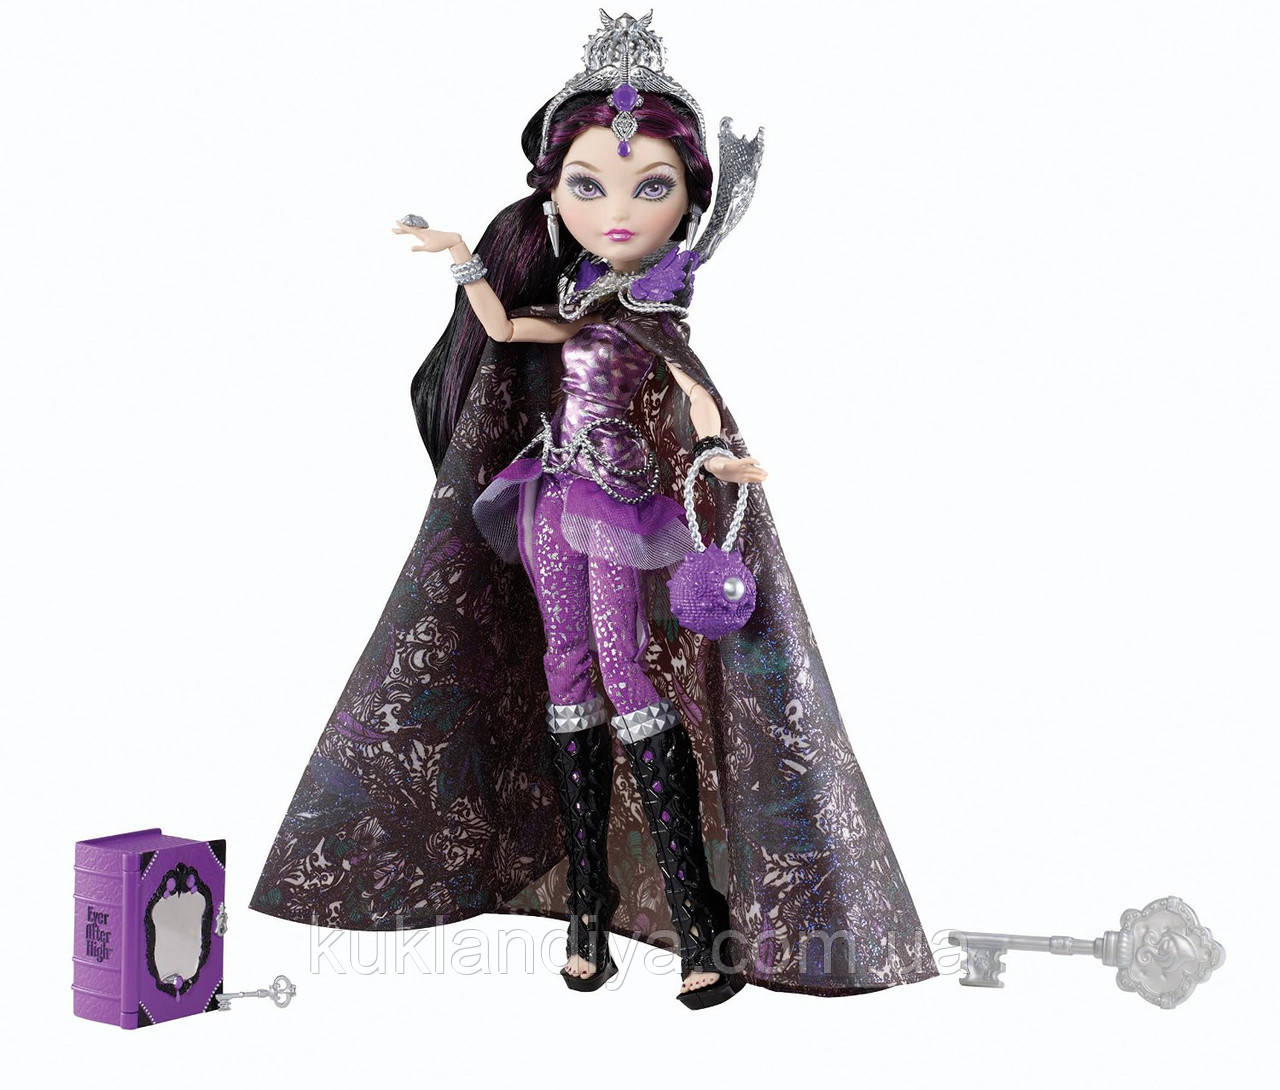 Кукла Ever After High Raven Queen Legacy Day Рейвен Куин День Наследия